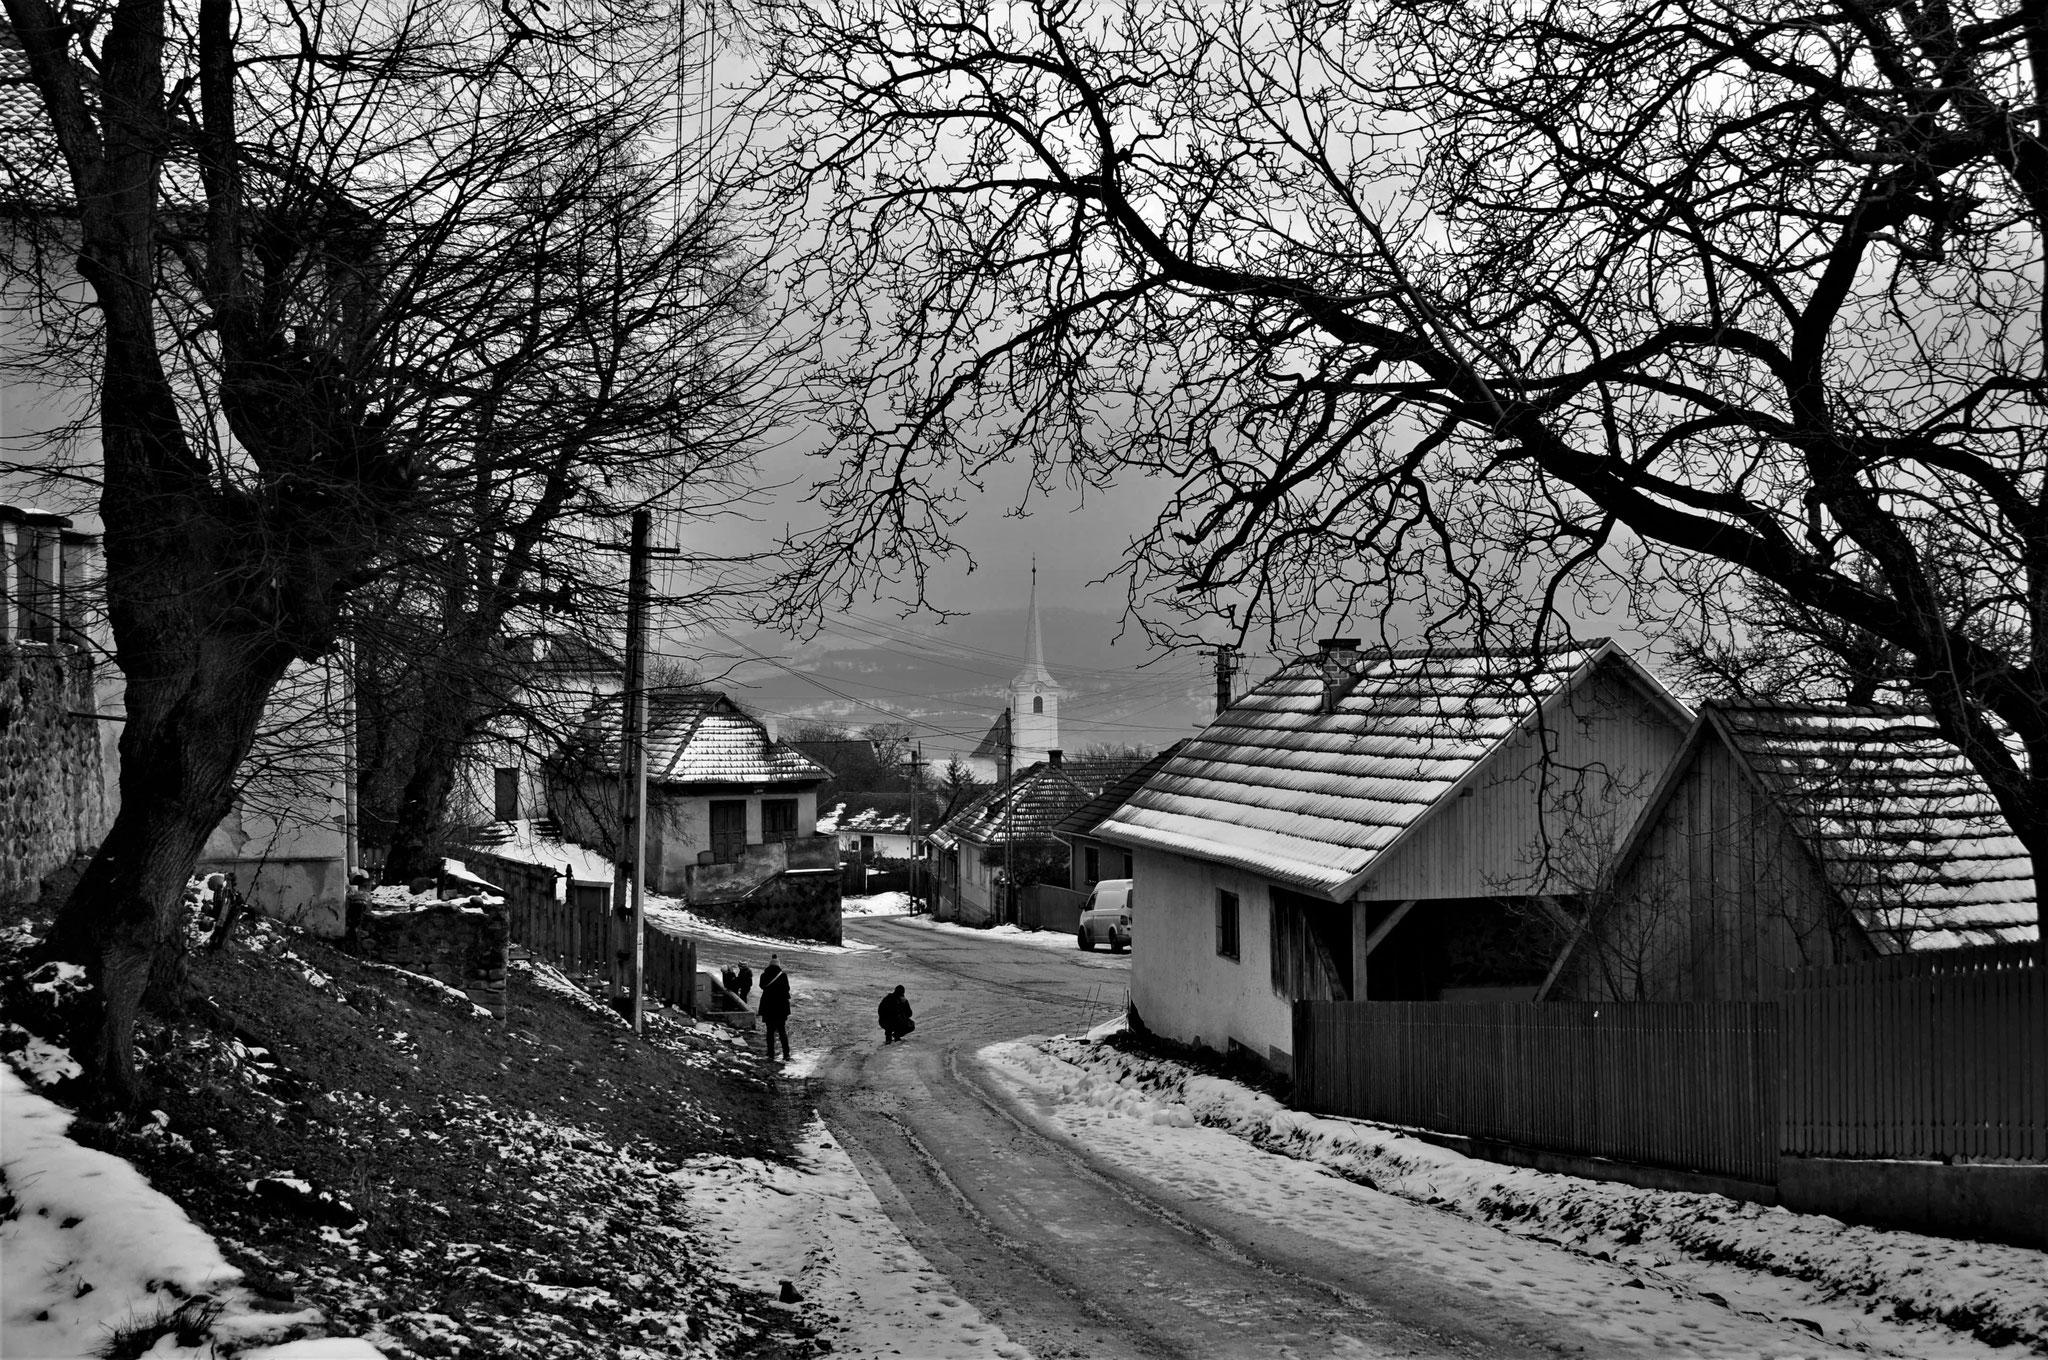 Andorkó-Gál Kinga (RO)